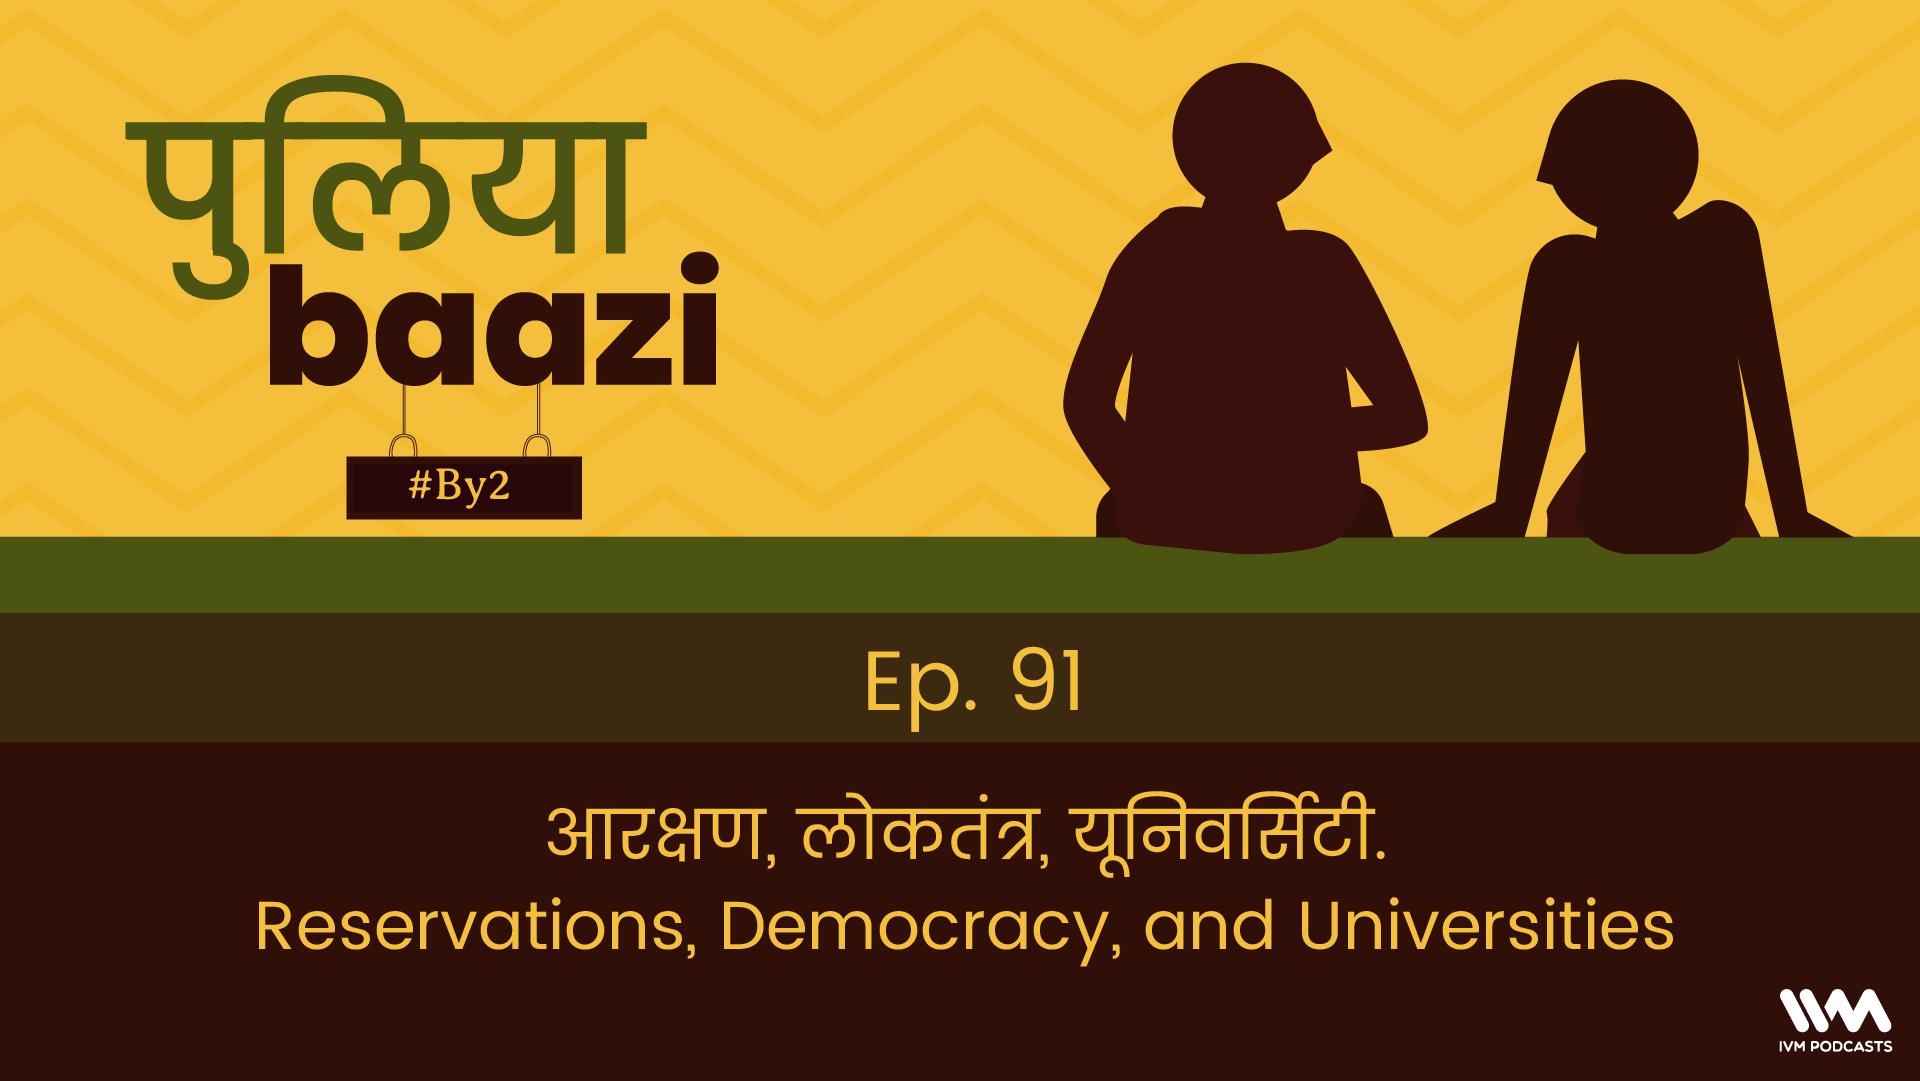 Ep. 91: आरक्षण, लोकतंत्र, यूनिवर्सिटी. Reservations, Democracy, and Universities